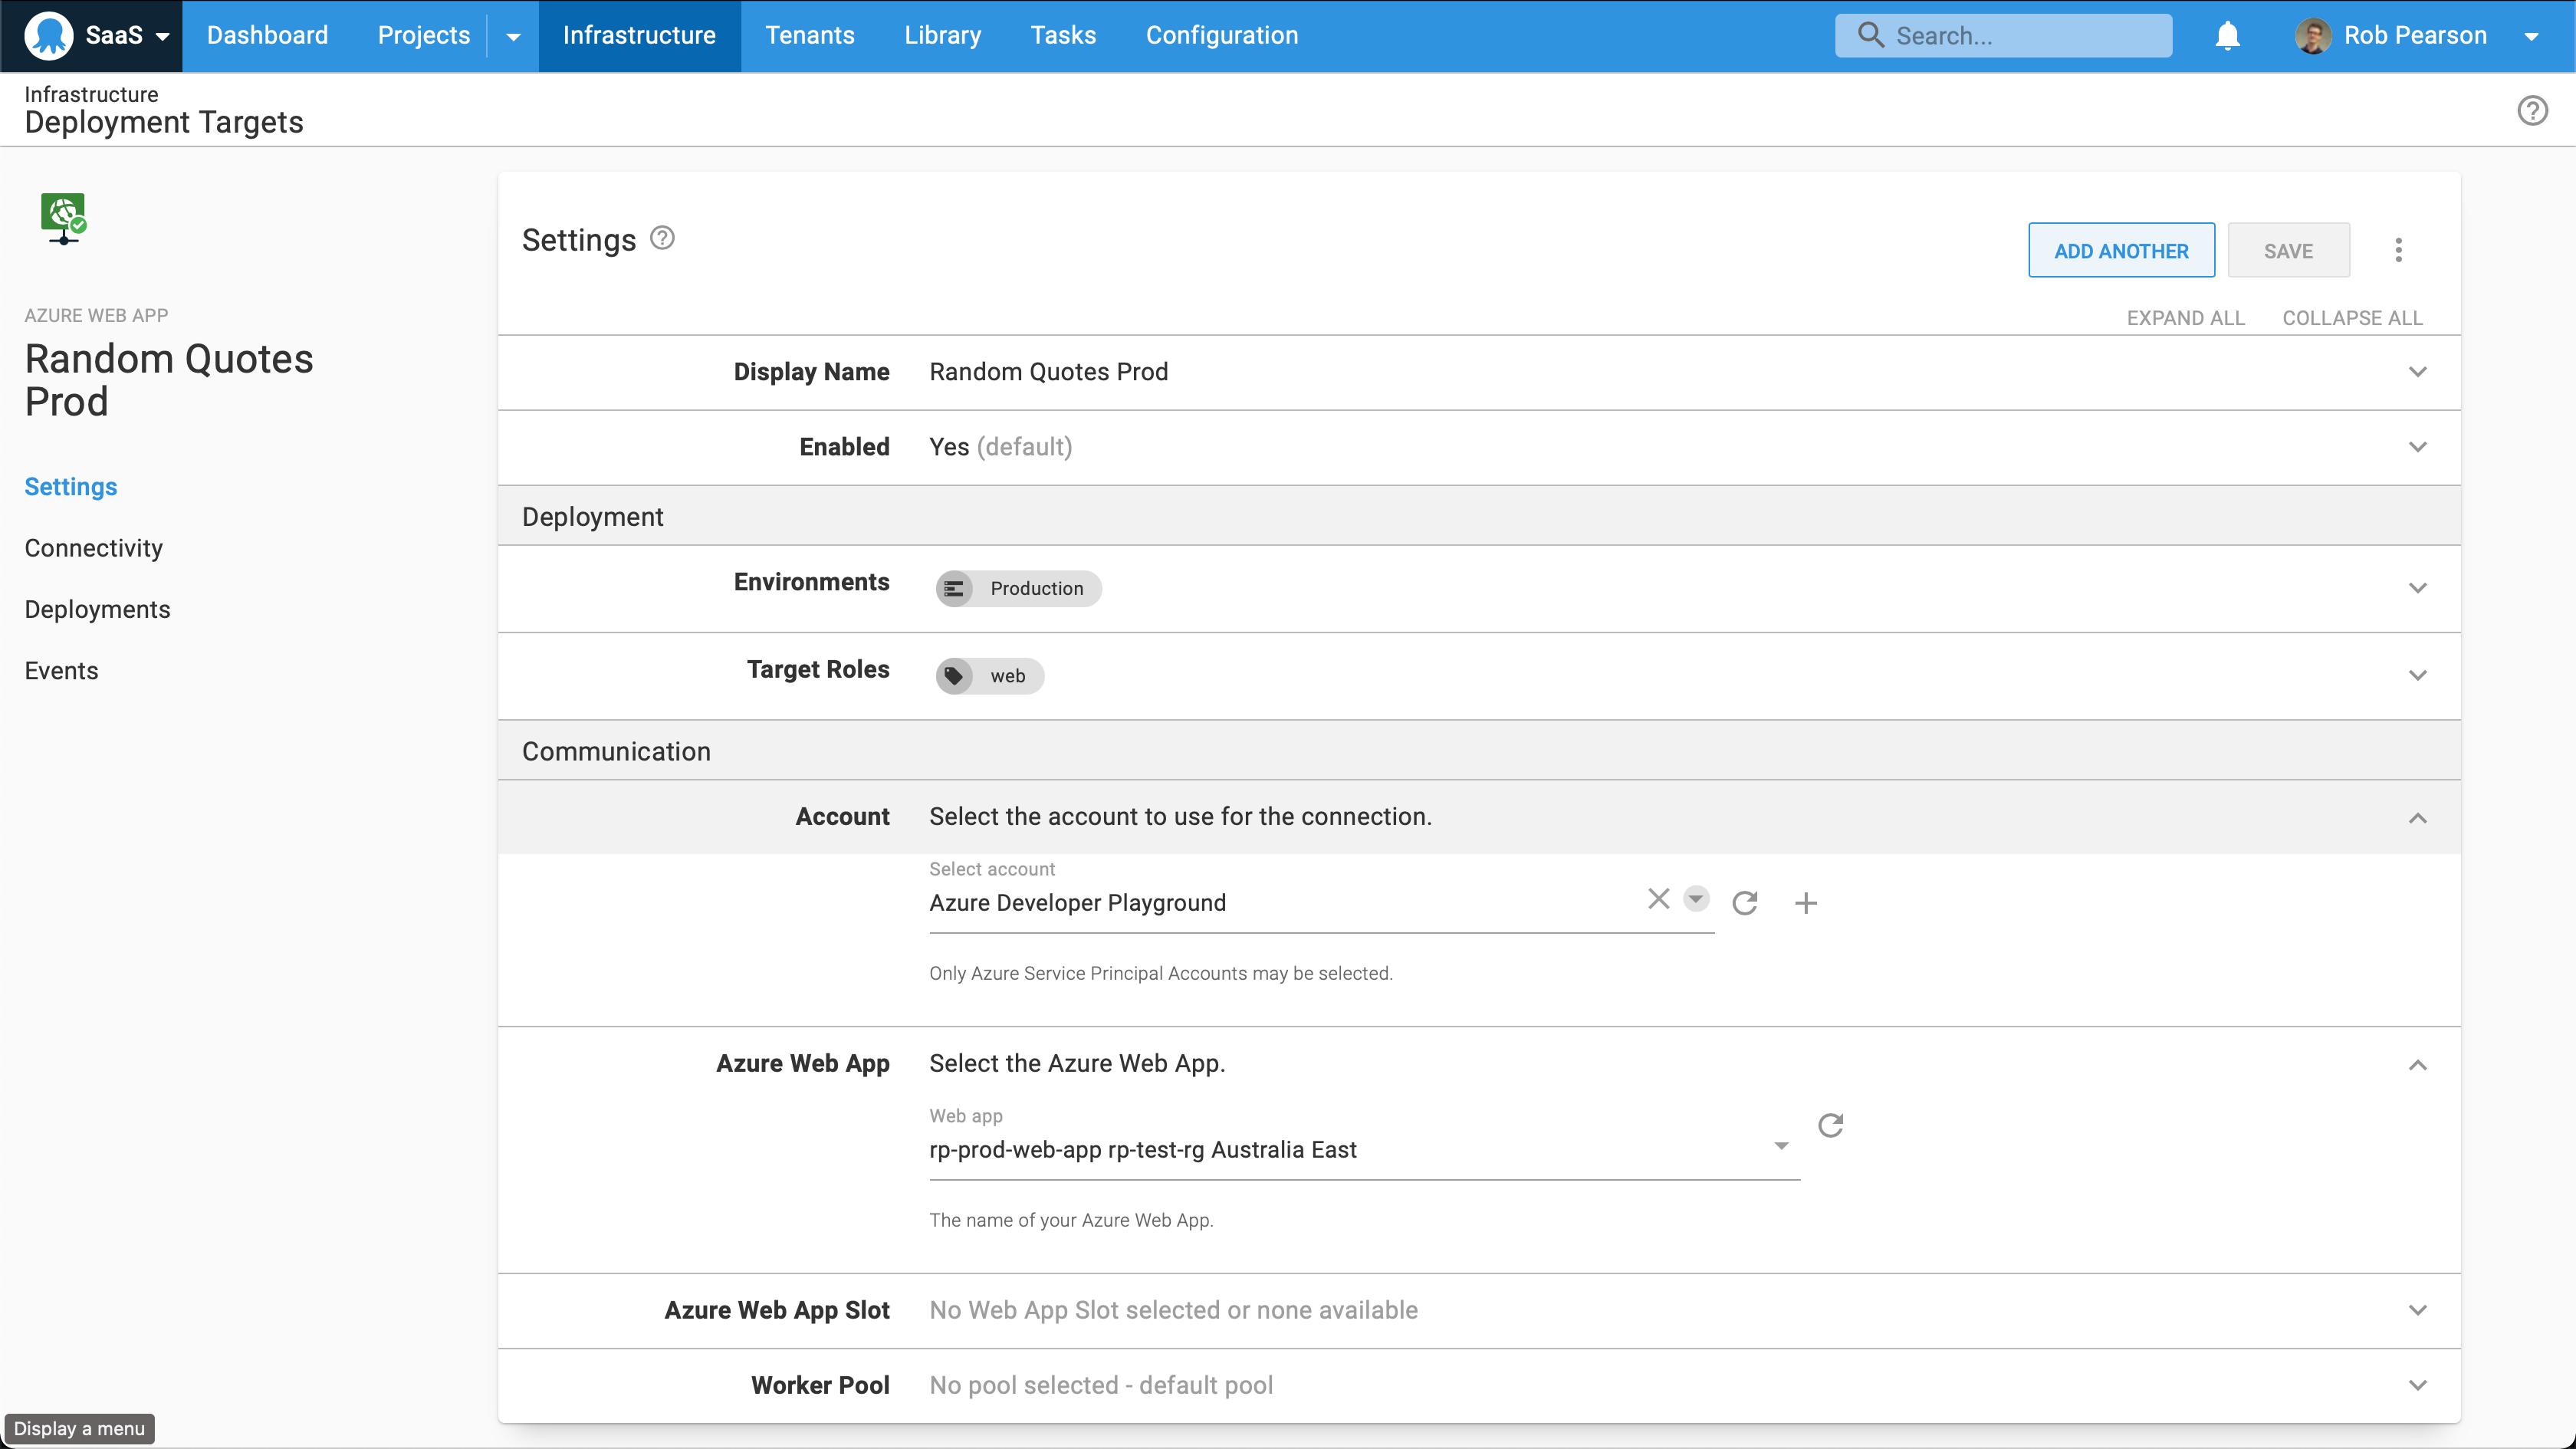 Azure web app deployment targets